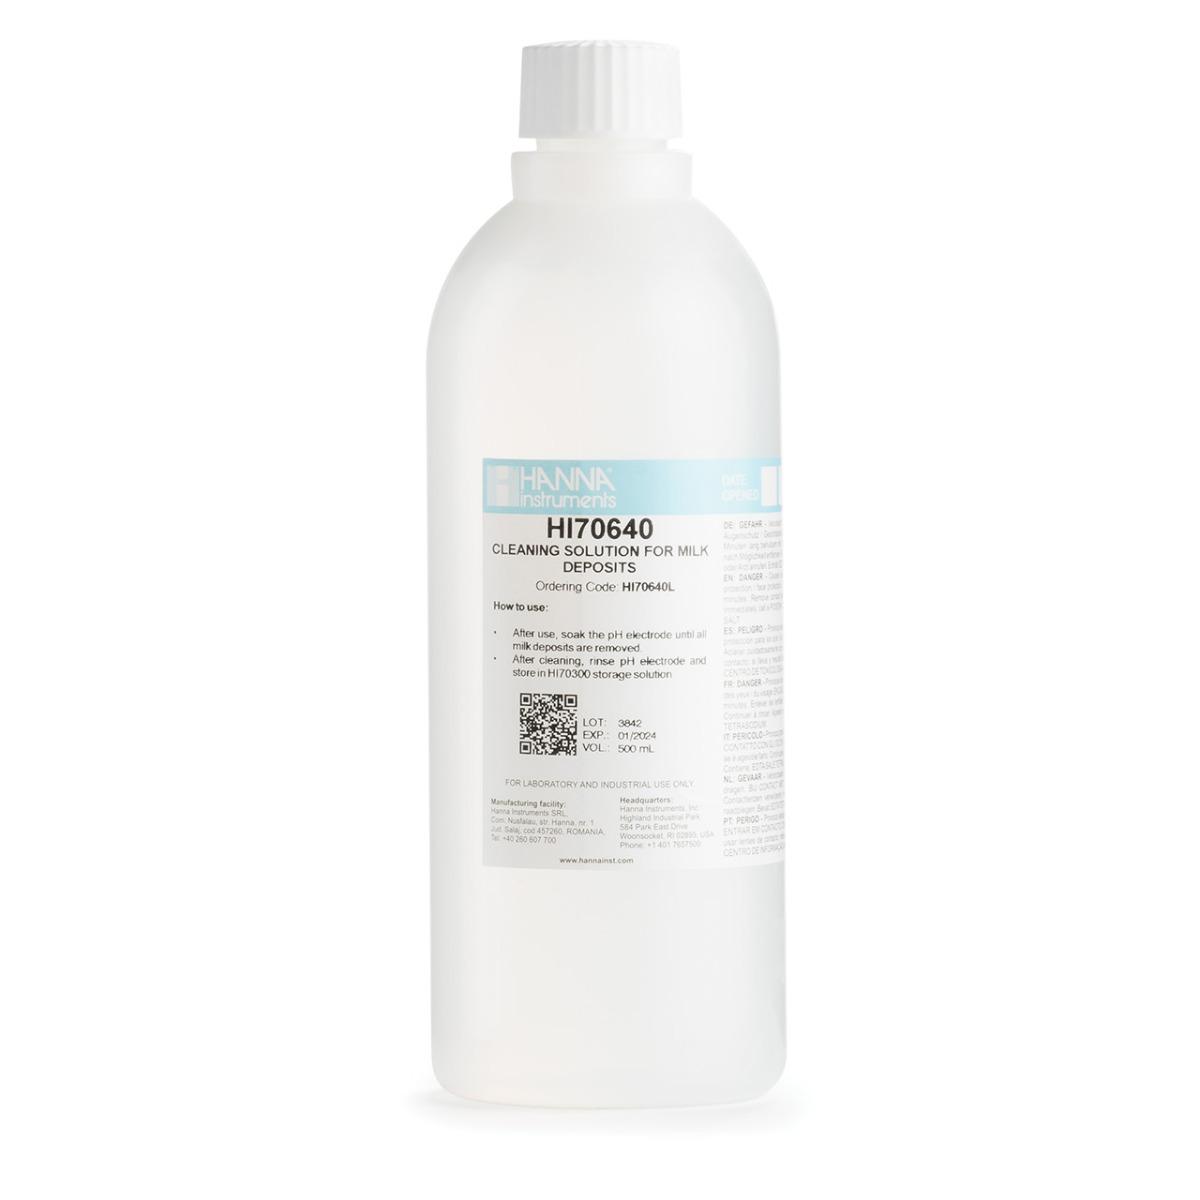 HI70640L Cleaning Solution for Milk Deposits (500 mL)